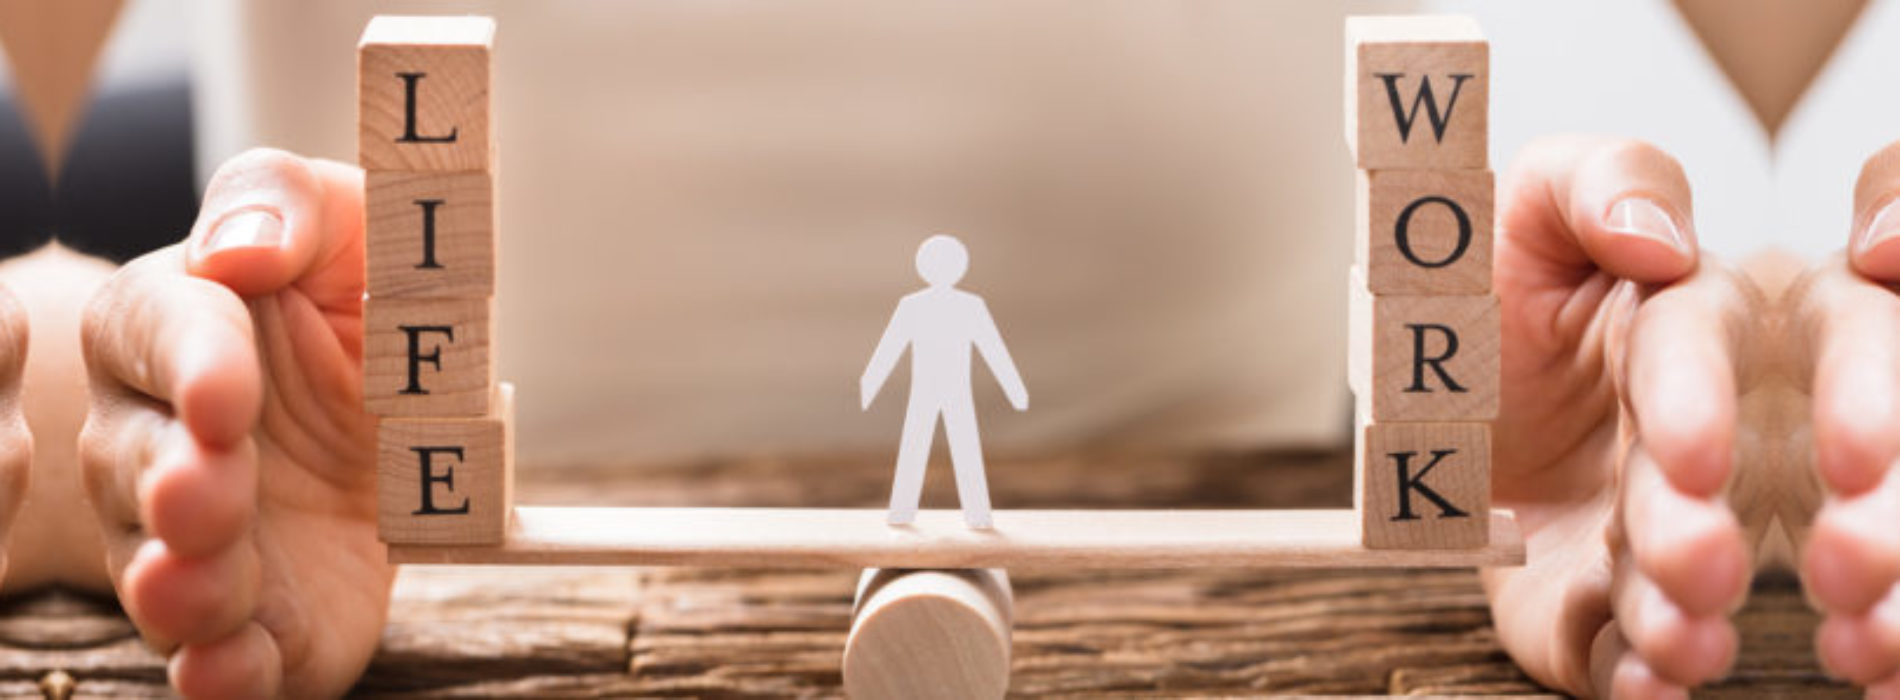 Top 10 tips For Work-Life Balance